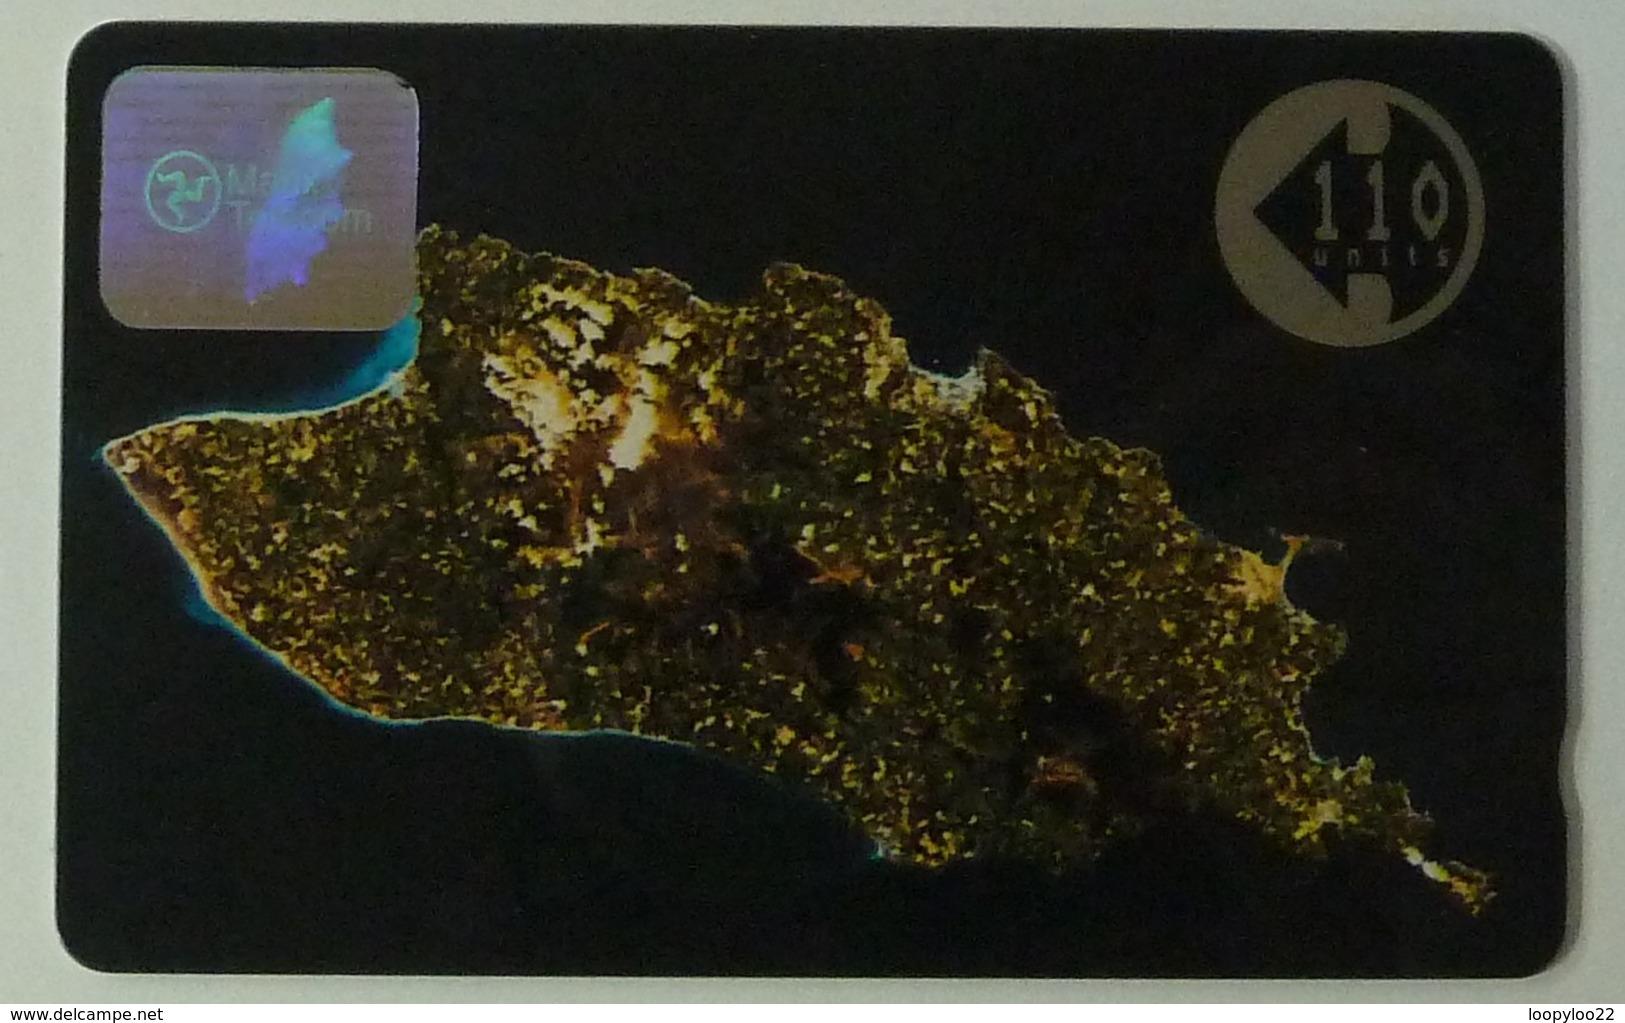 ISLE OF MAN - GPT - 9IOMA - Larger Control - 110 Units - Satellite Picture - Mint - Isla De Man